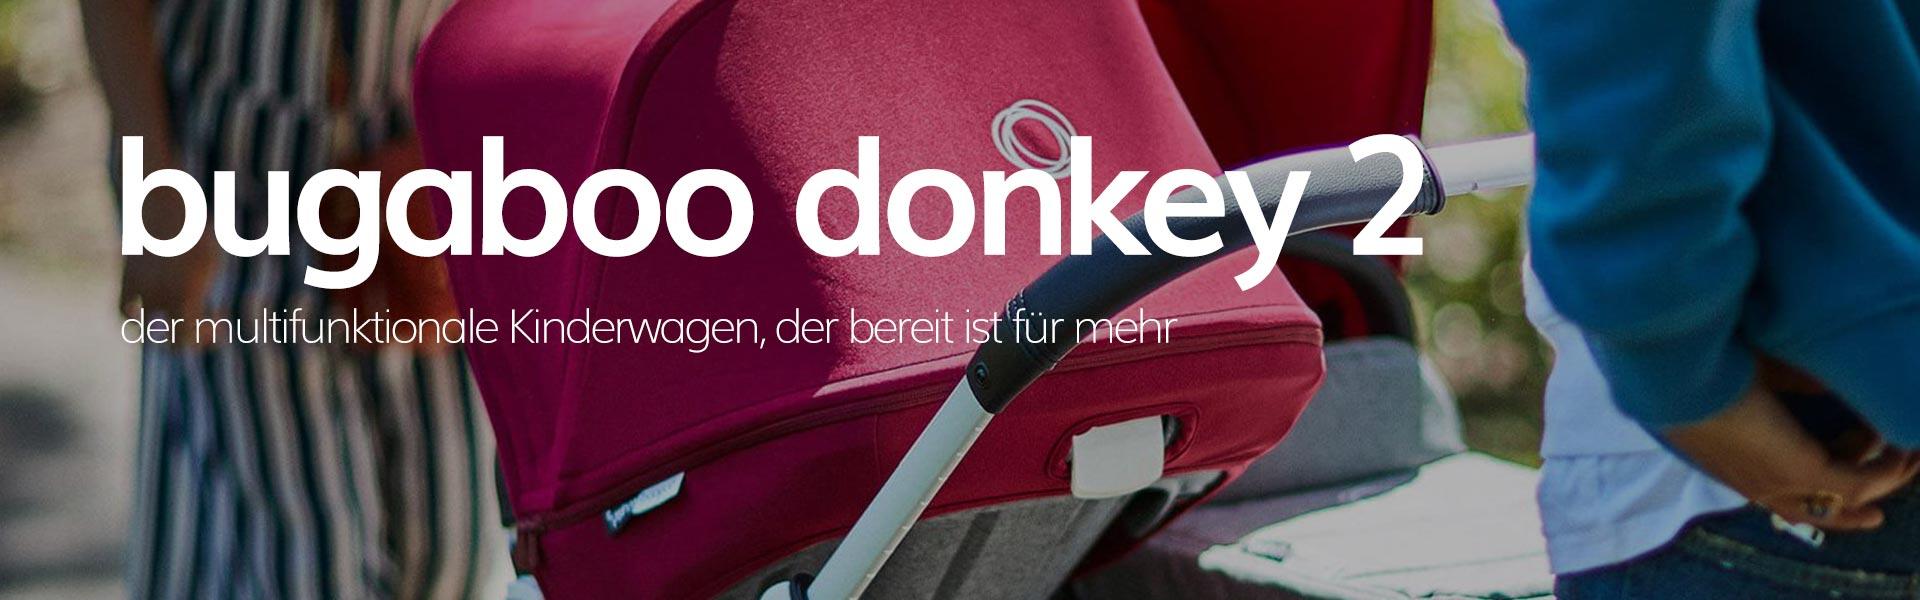 Bugaboo-Donkey2 - KATEGORIE